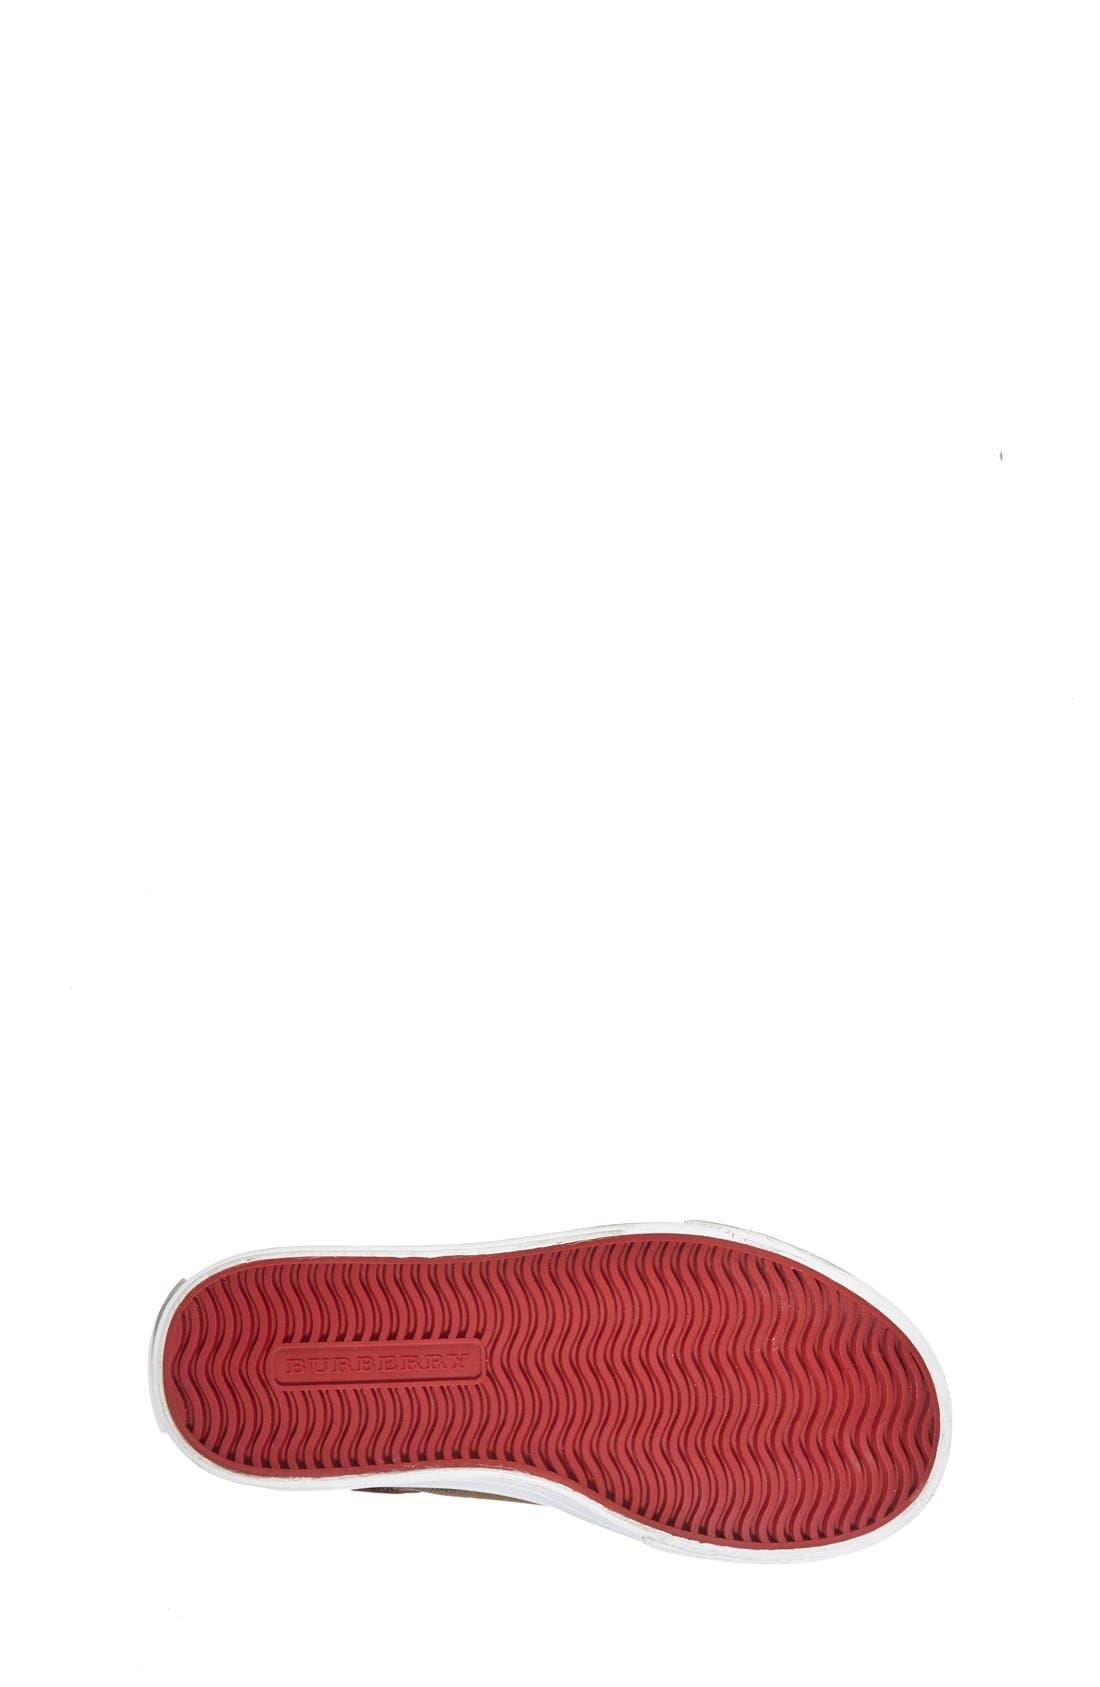 Mini Heacham Sneaker,                             Alternate thumbnail 4, color,                             PARADE RED